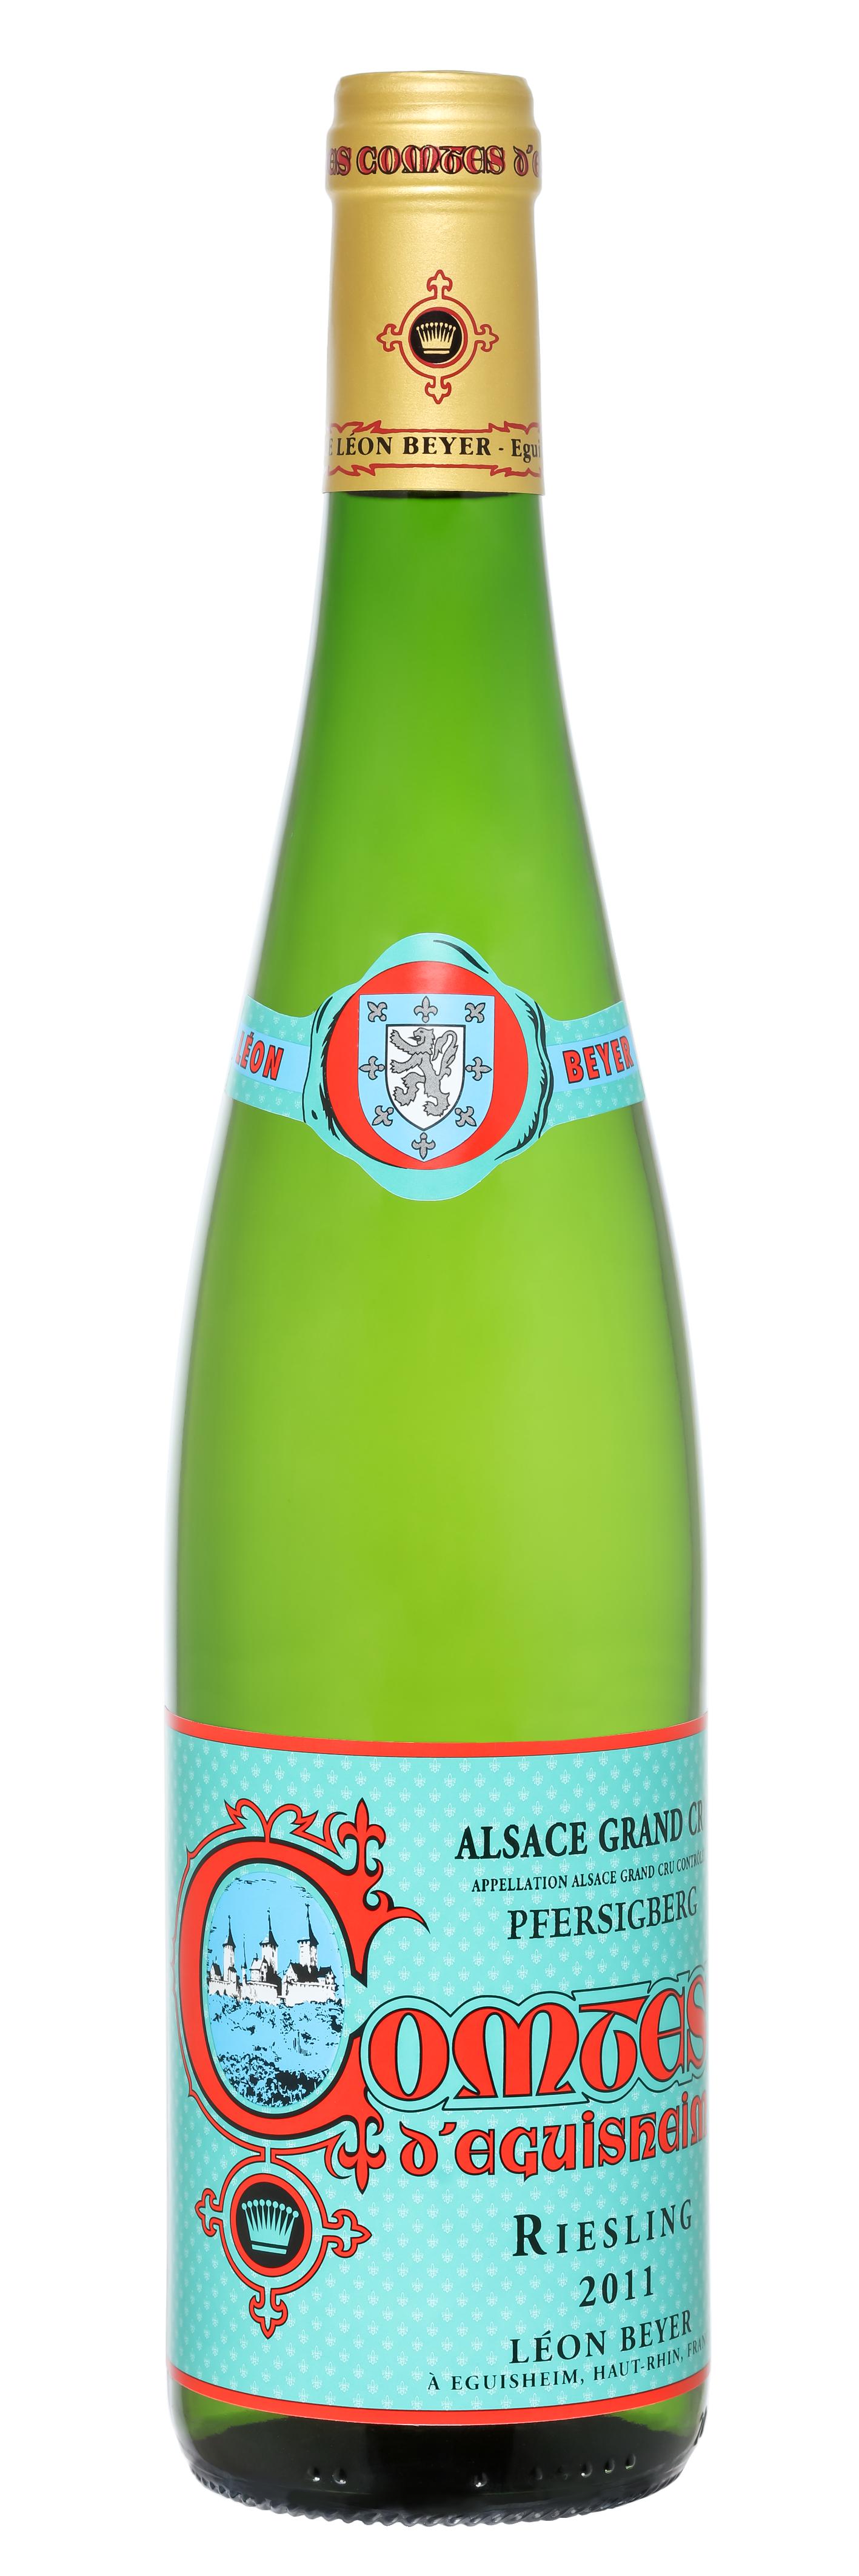 Alsace Grand Cru Pfersigberg Riesling